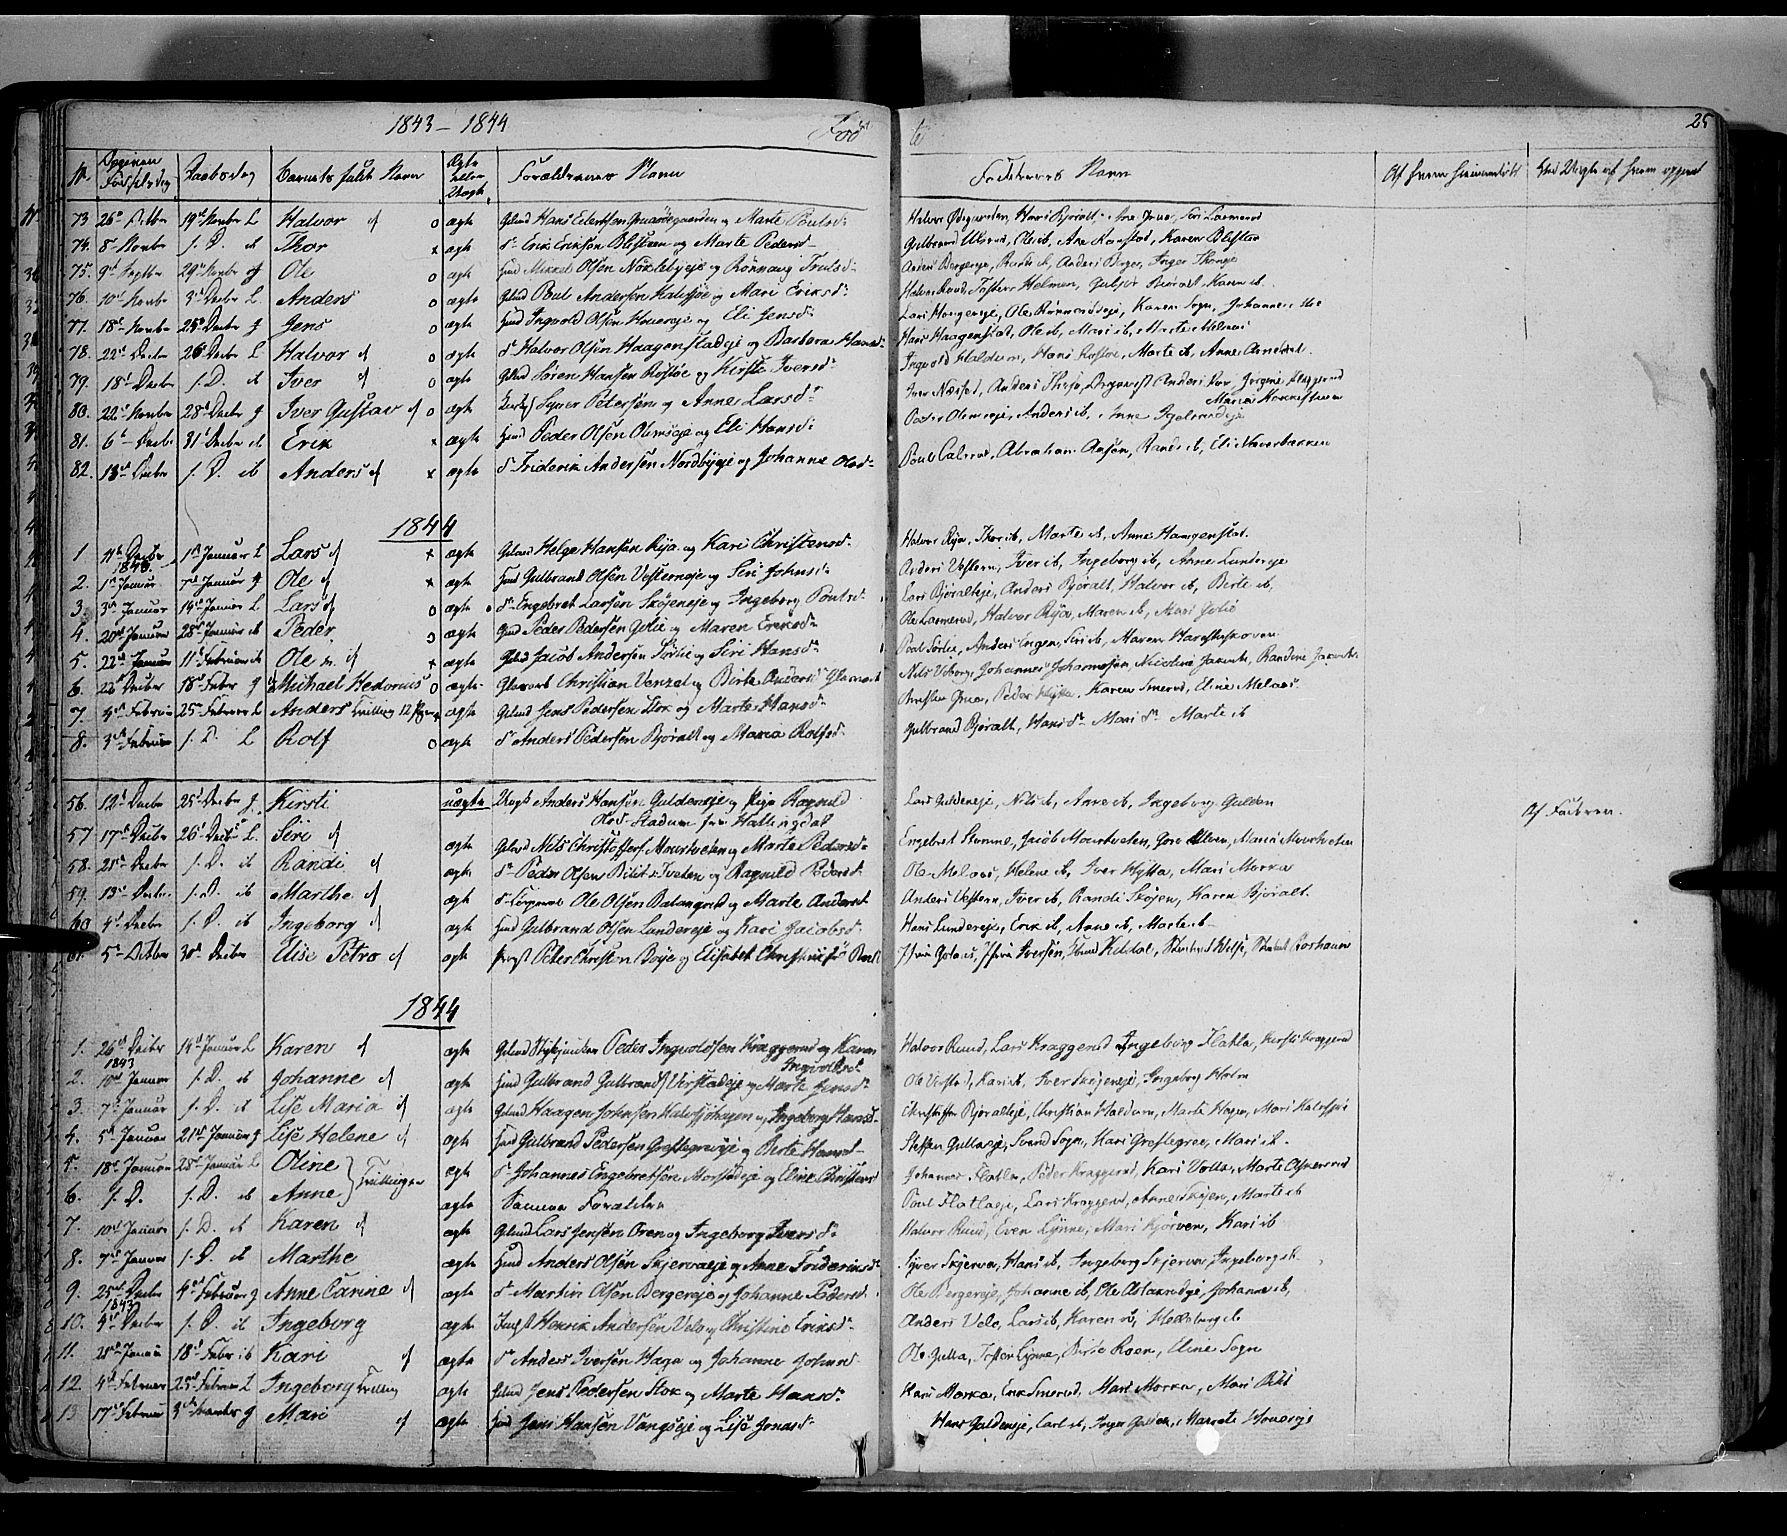 SAH, Jevnaker prestekontor, Ministerialbok nr. 6, 1837-1857, s. 25